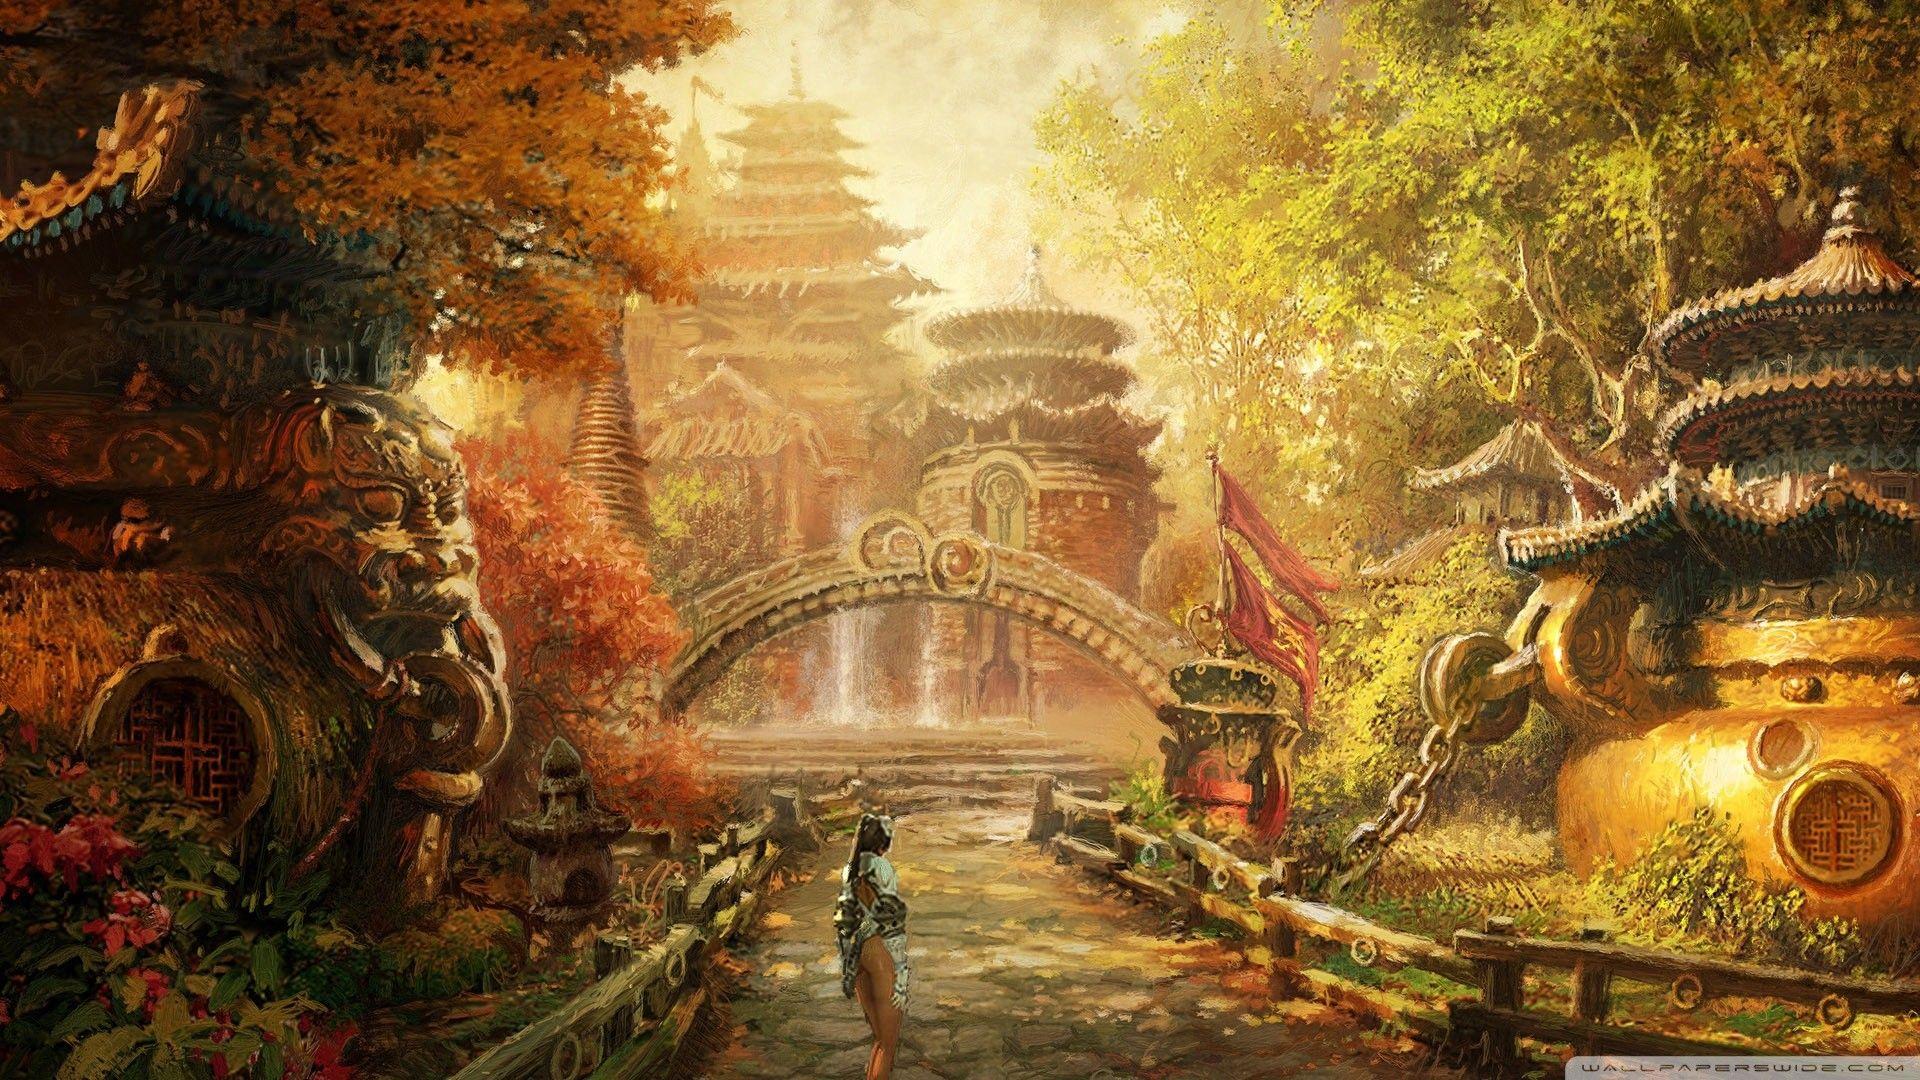 Fantasy Art Wallpapers High Quality Resolution Fantasy Landscape